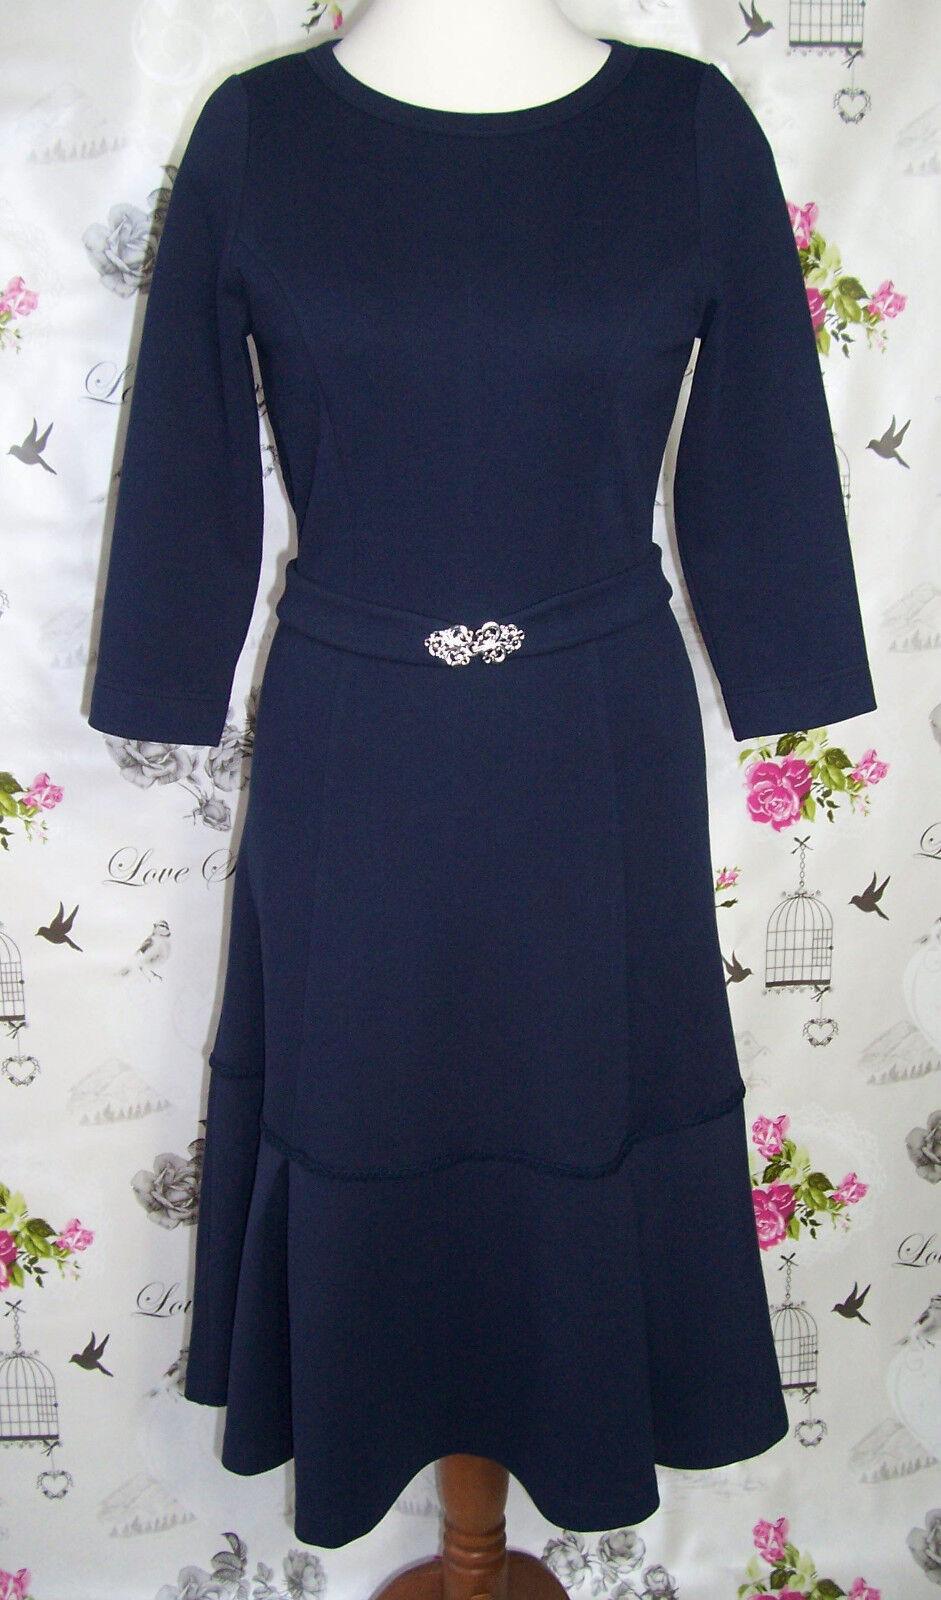 RC Kleid Romanit Jersey Dunkelblau Gr.38-40 3 4-Ärmel Volant Retro Handarbeit